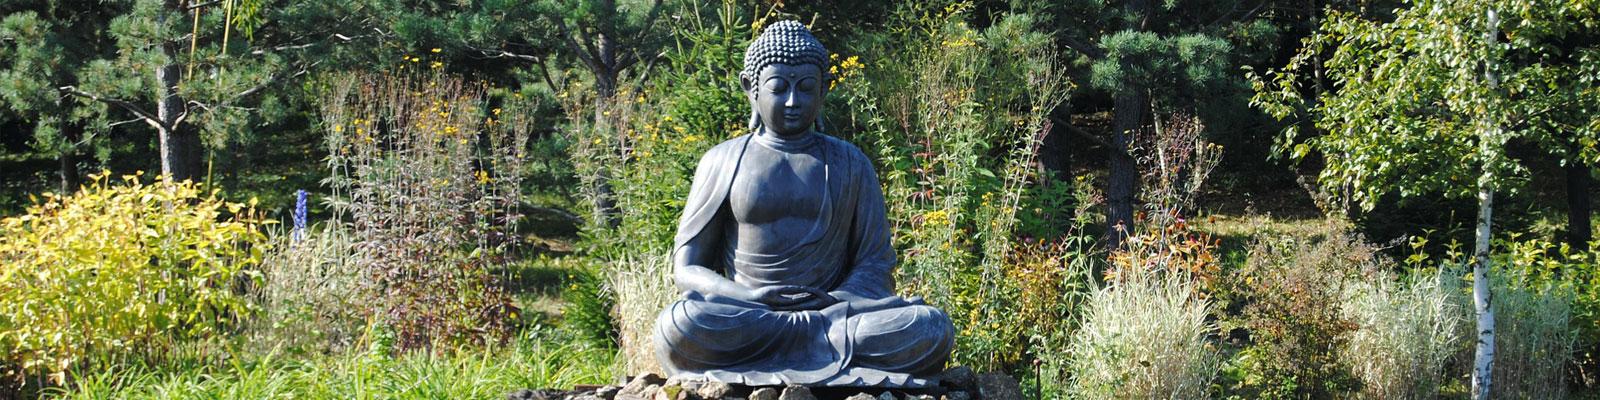 buddha - Copy